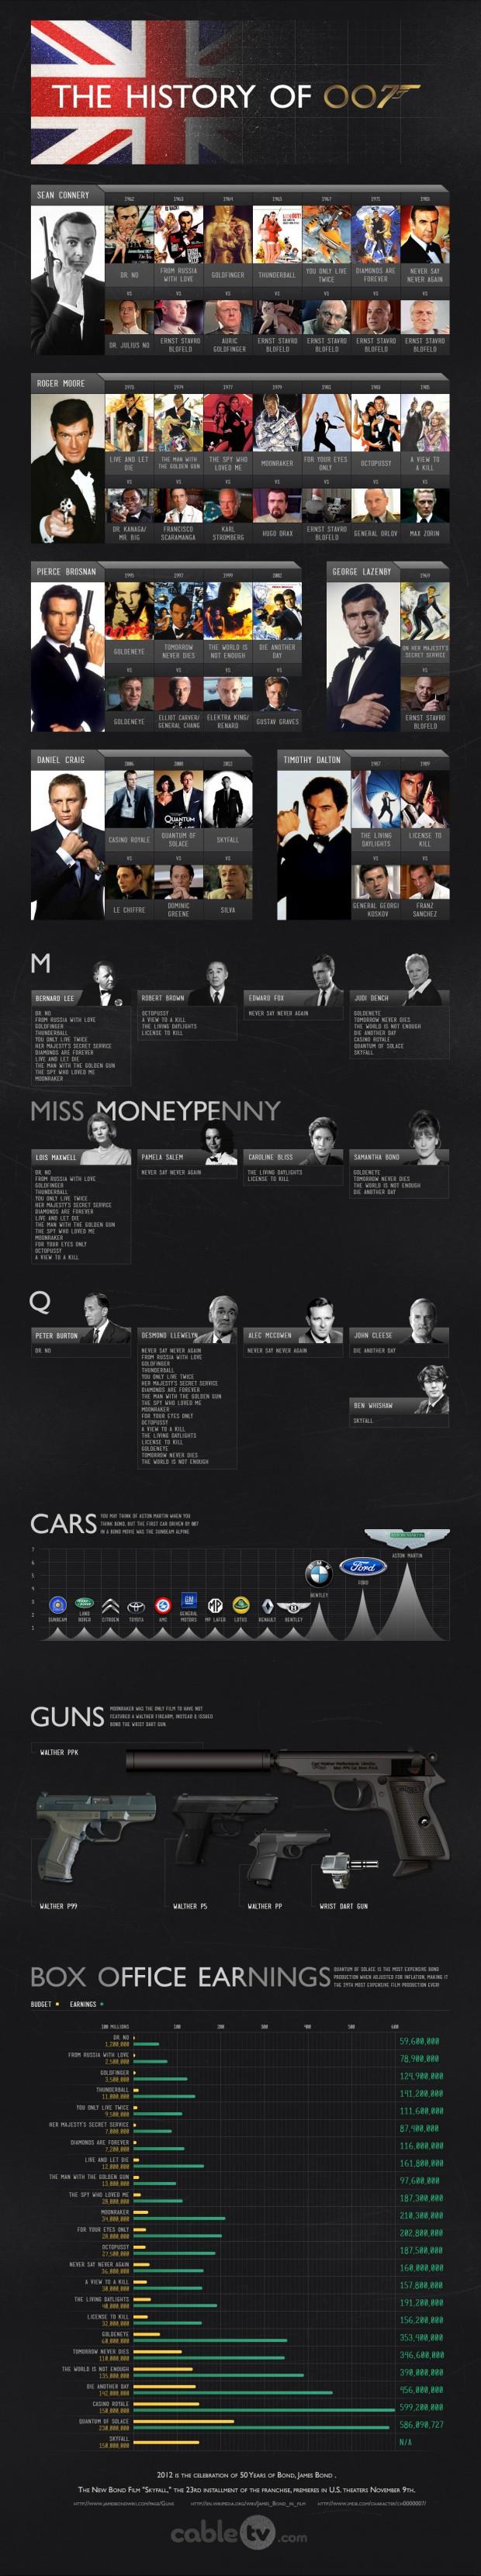 10. The history of James Bond, 007